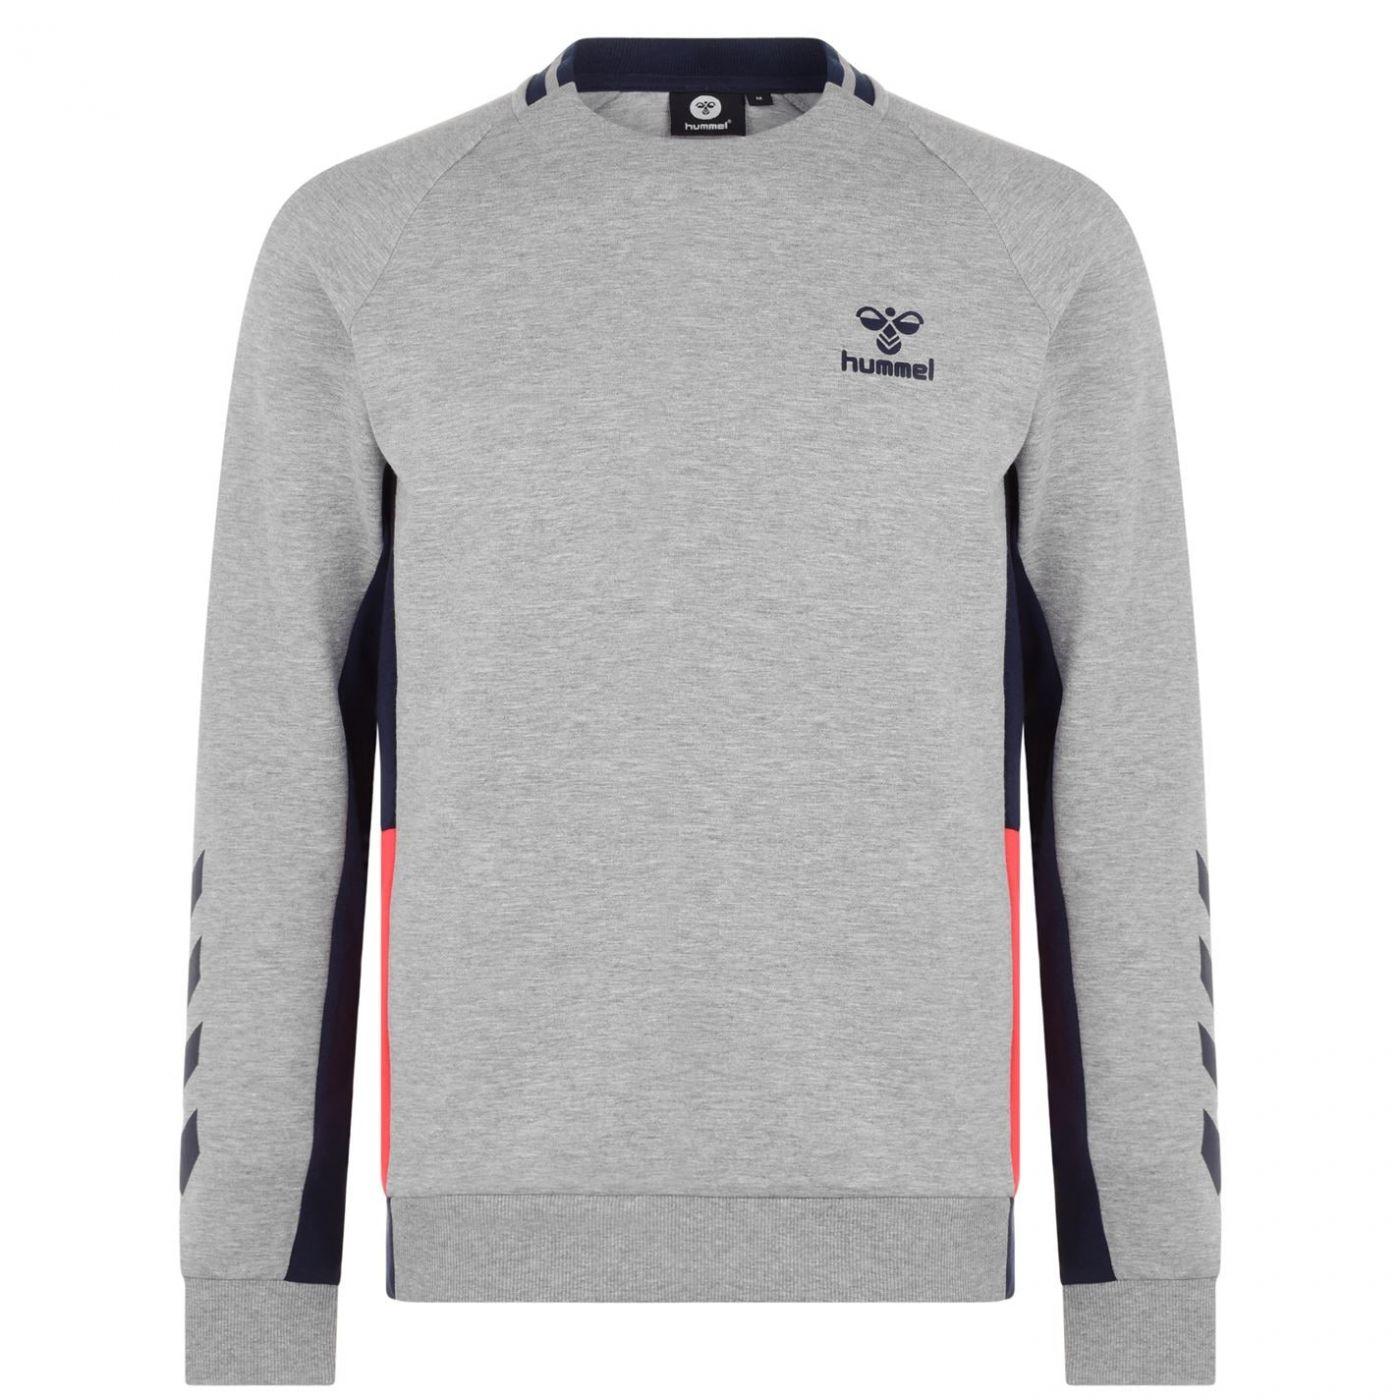 Hummel Maestro Sweatshirt